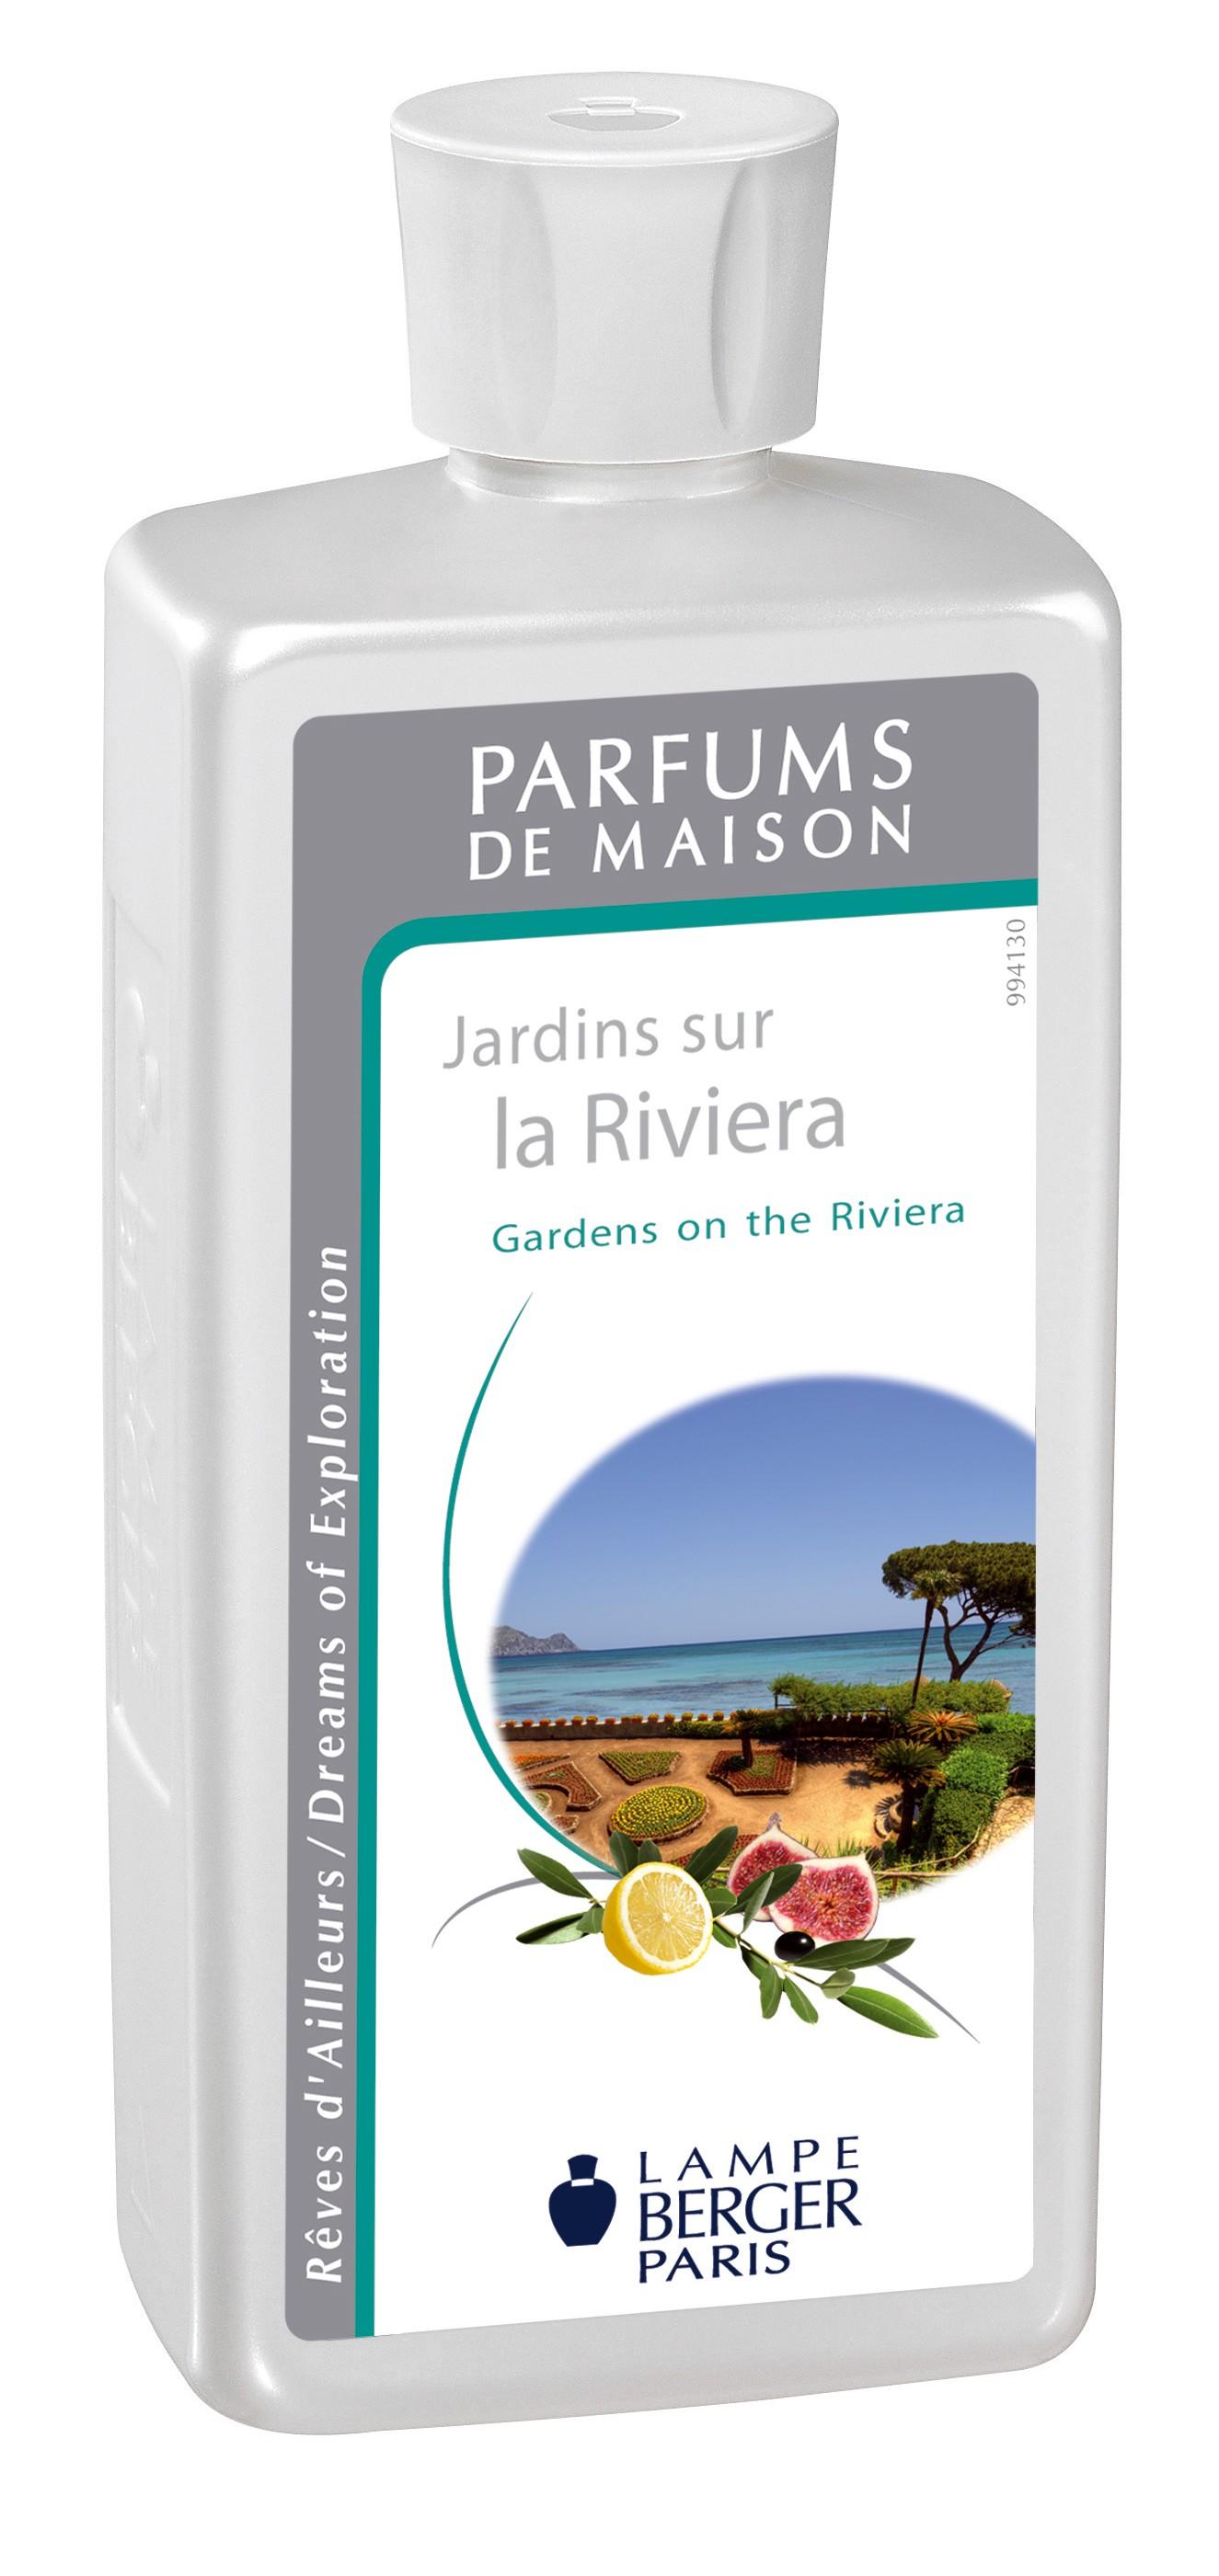 Jardins sur la Riviera